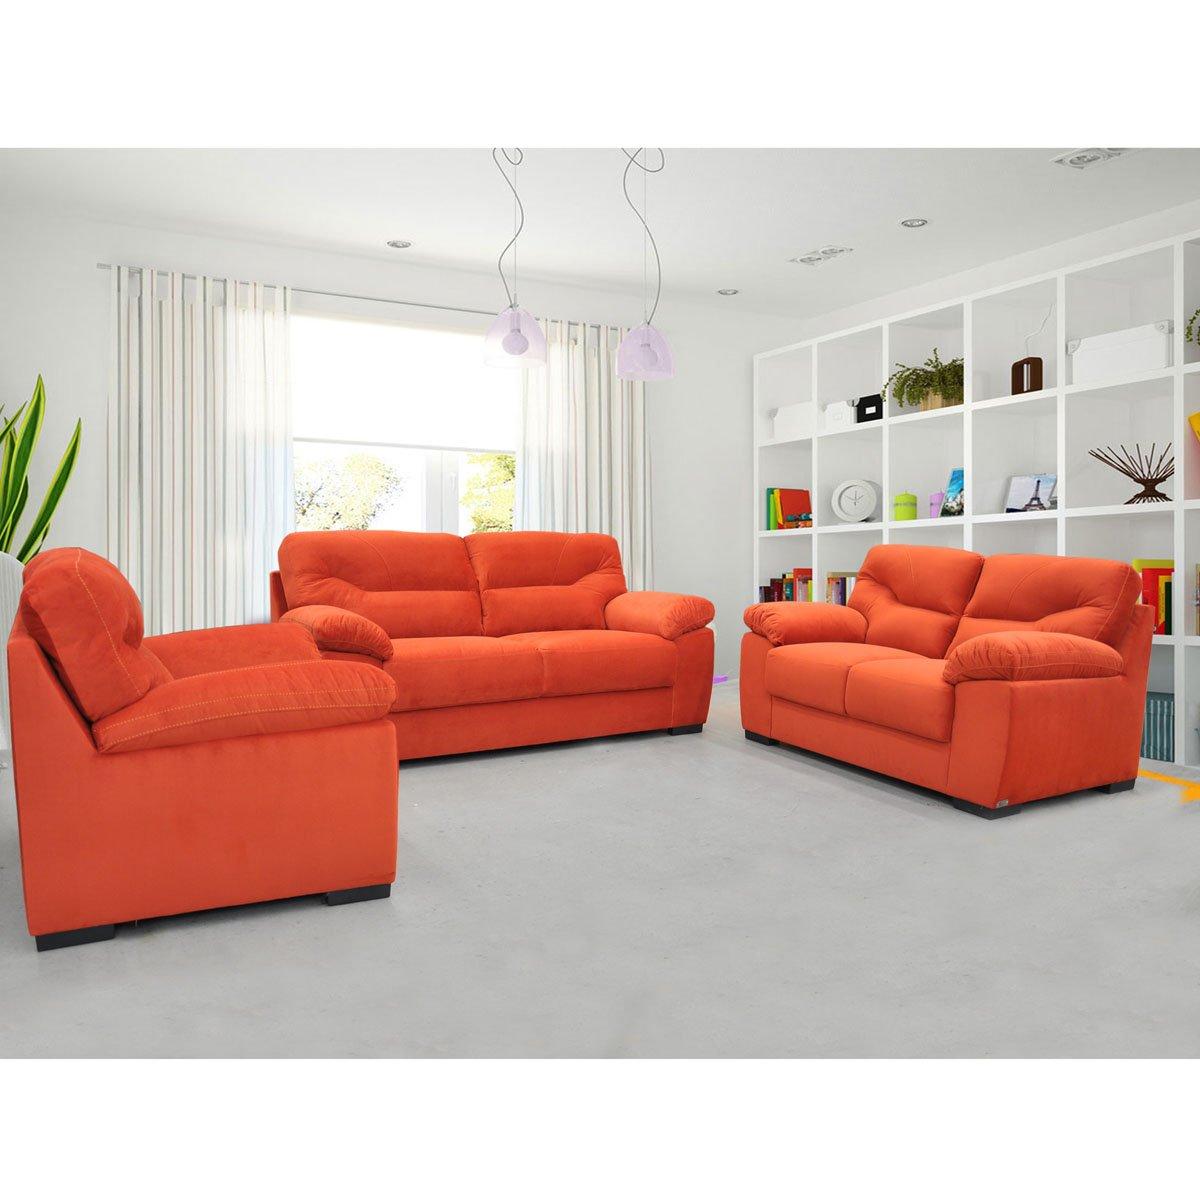 Sof cartagena tapizado tela persimon - Tela tapizado sofa ...